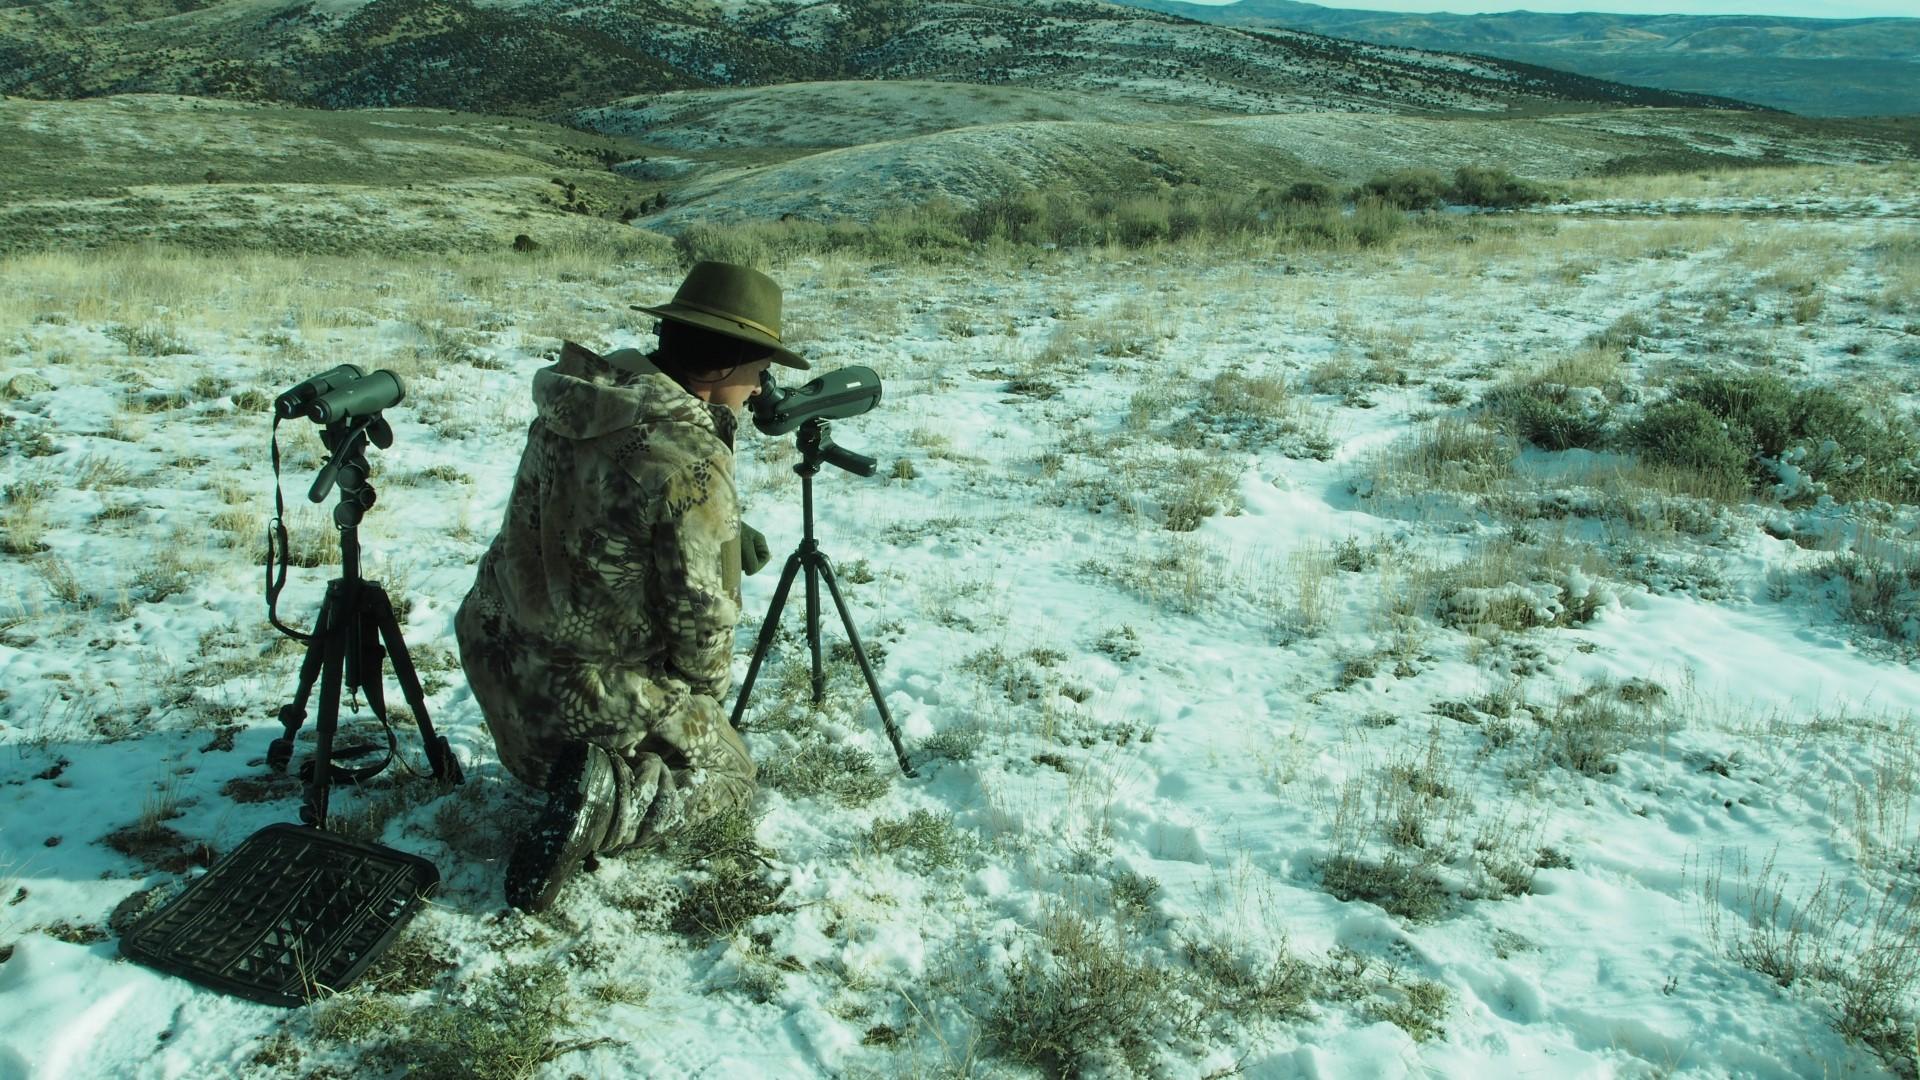 Krypek on the hunt Large